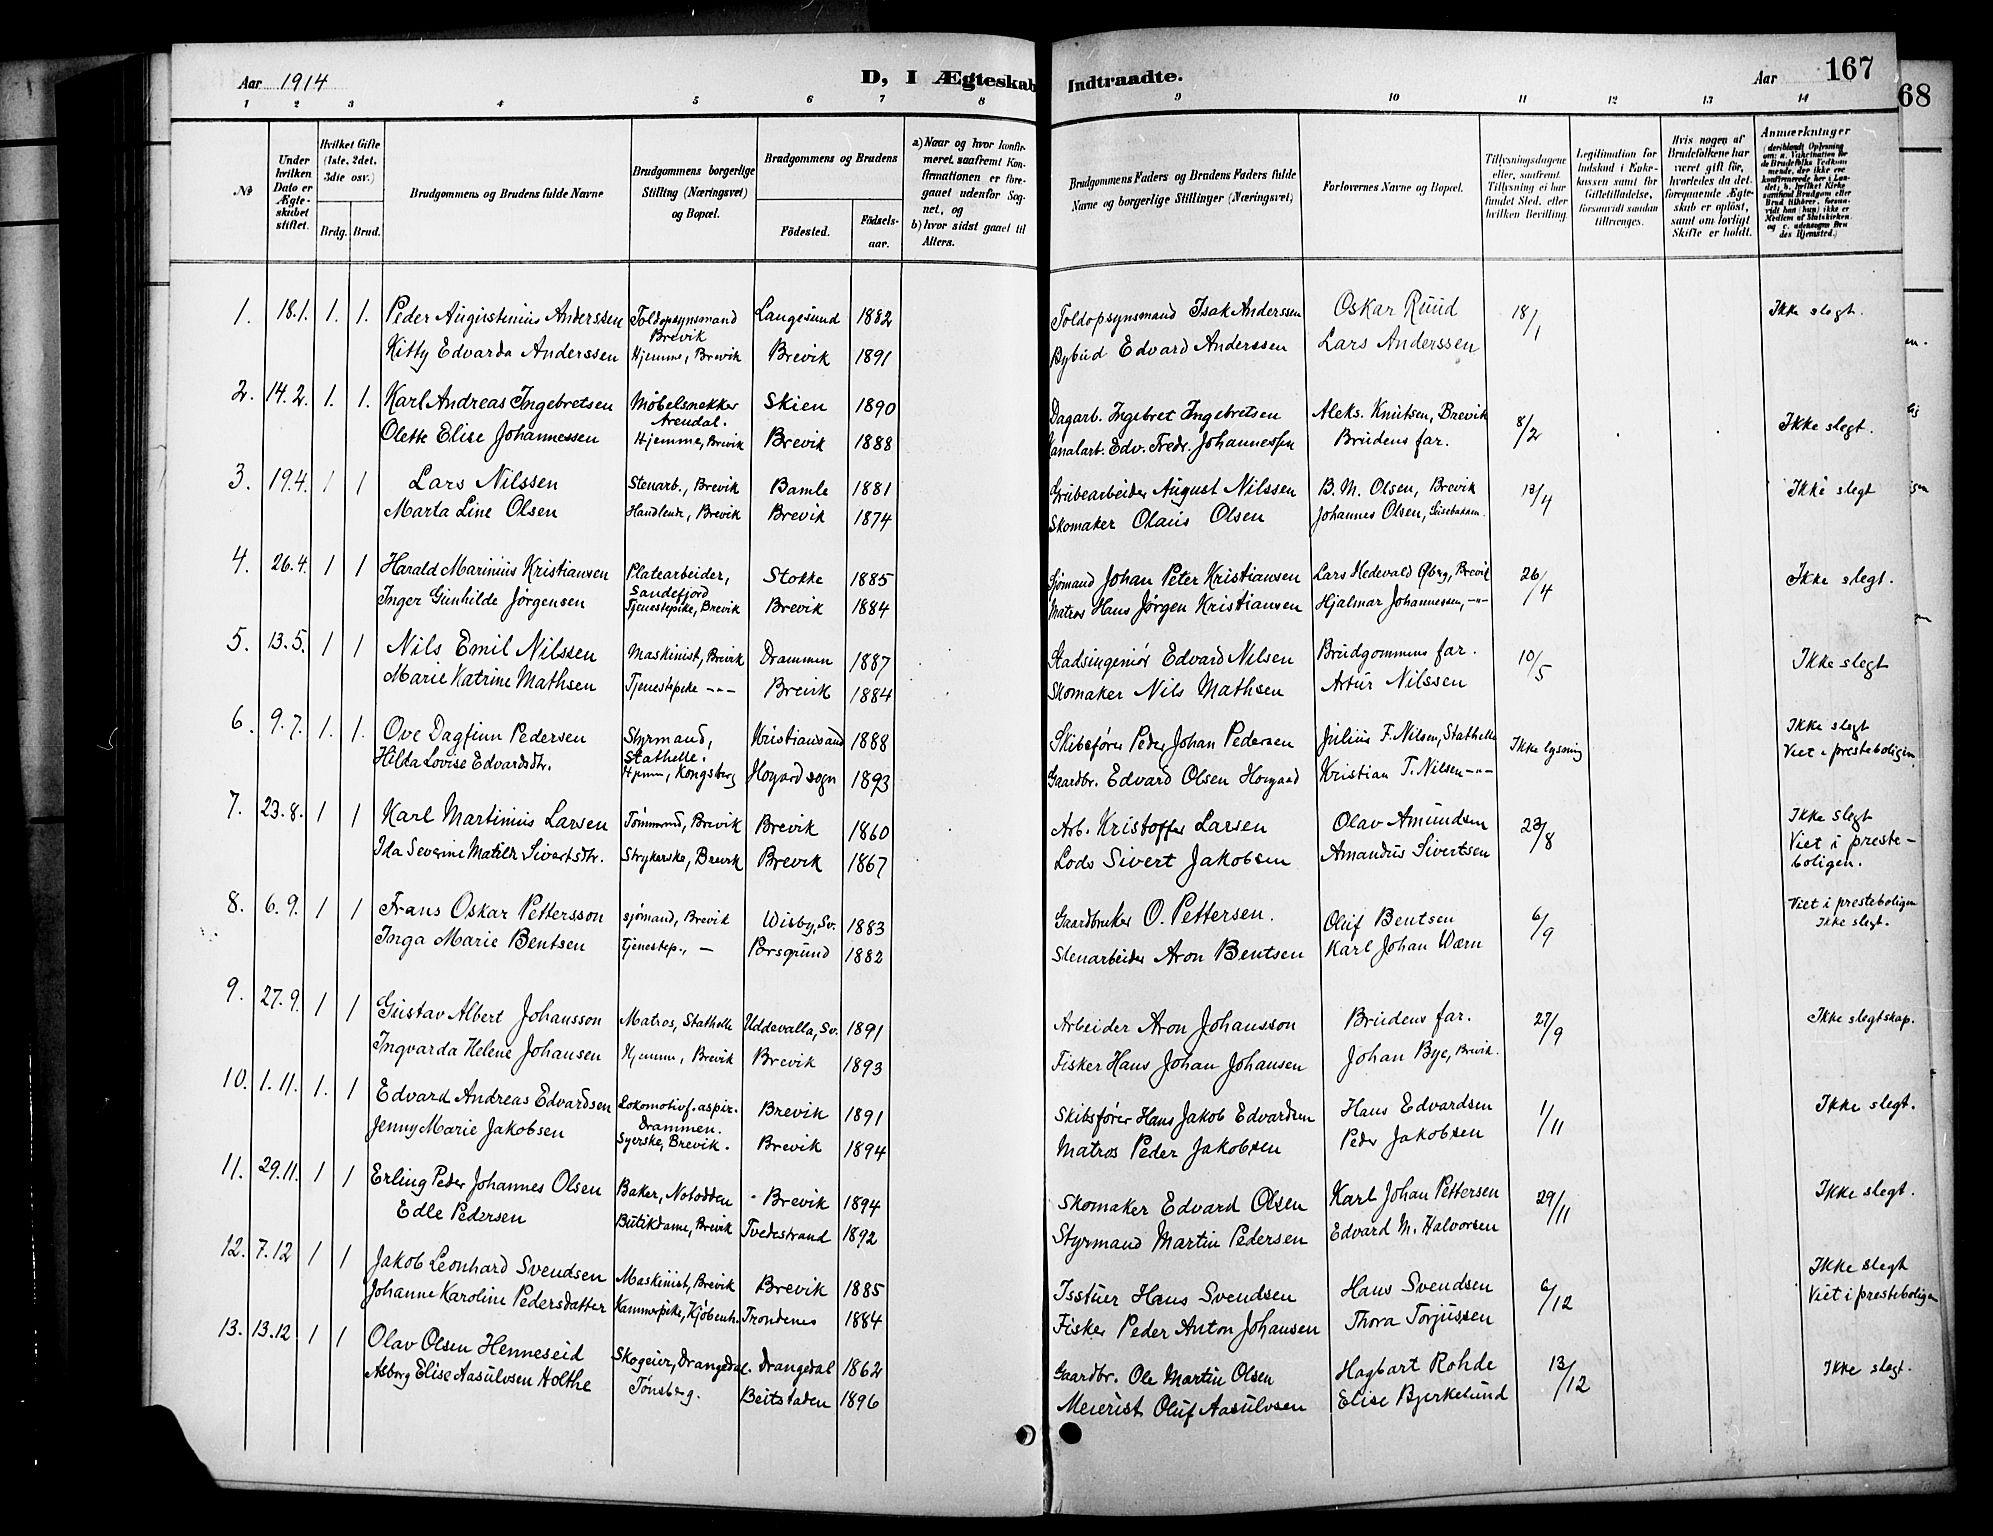 SAKO, Brevik kirkebøker, G/Ga/L0005: Klokkerbok nr. 5, 1901-1924, s. 167